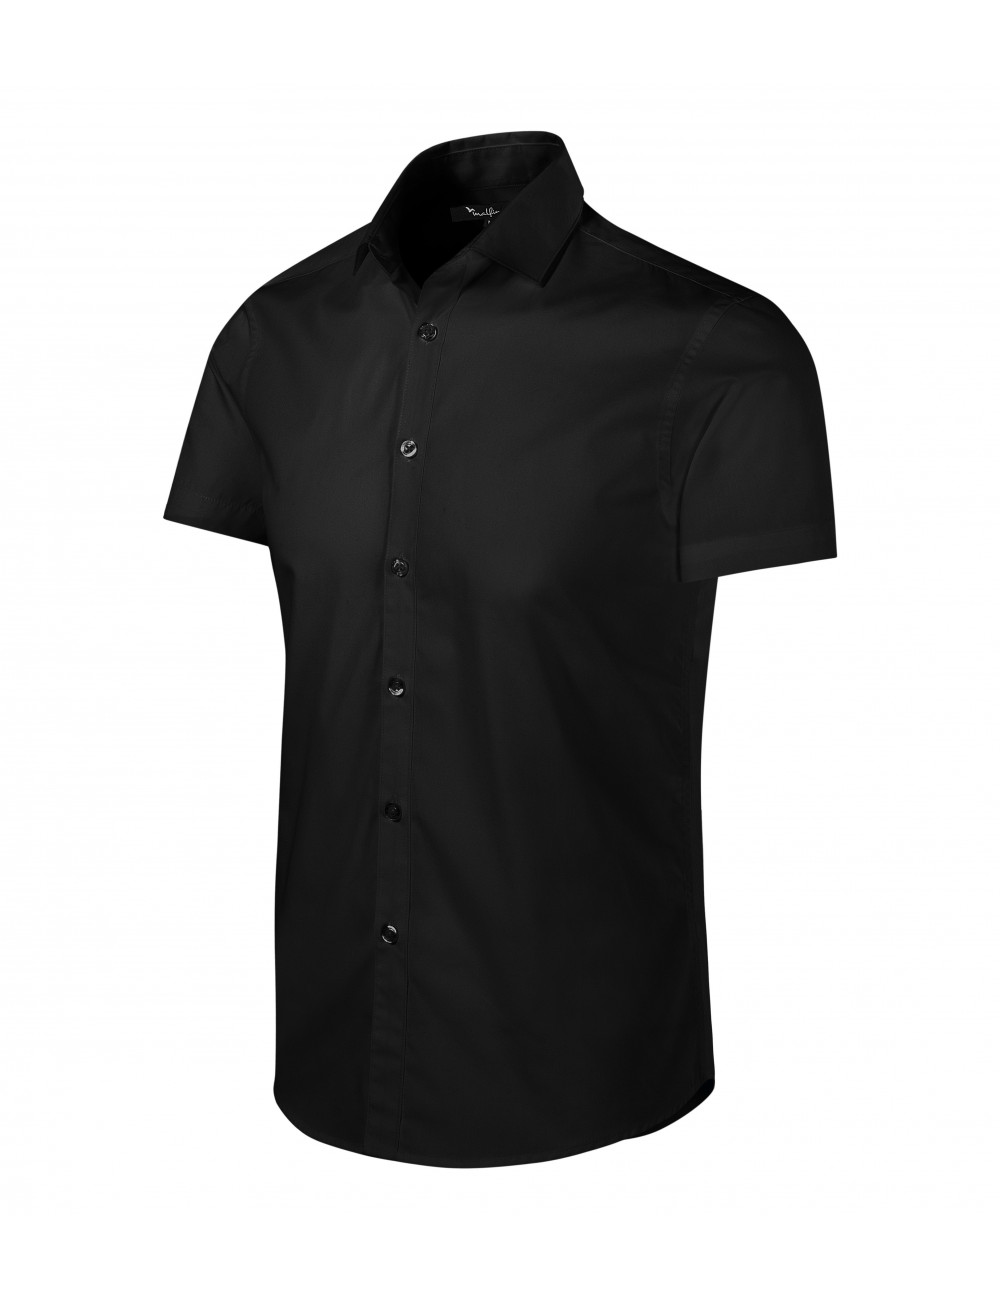 Adler MALFINIPREMIUM Koszula męska Flash 260 czarny